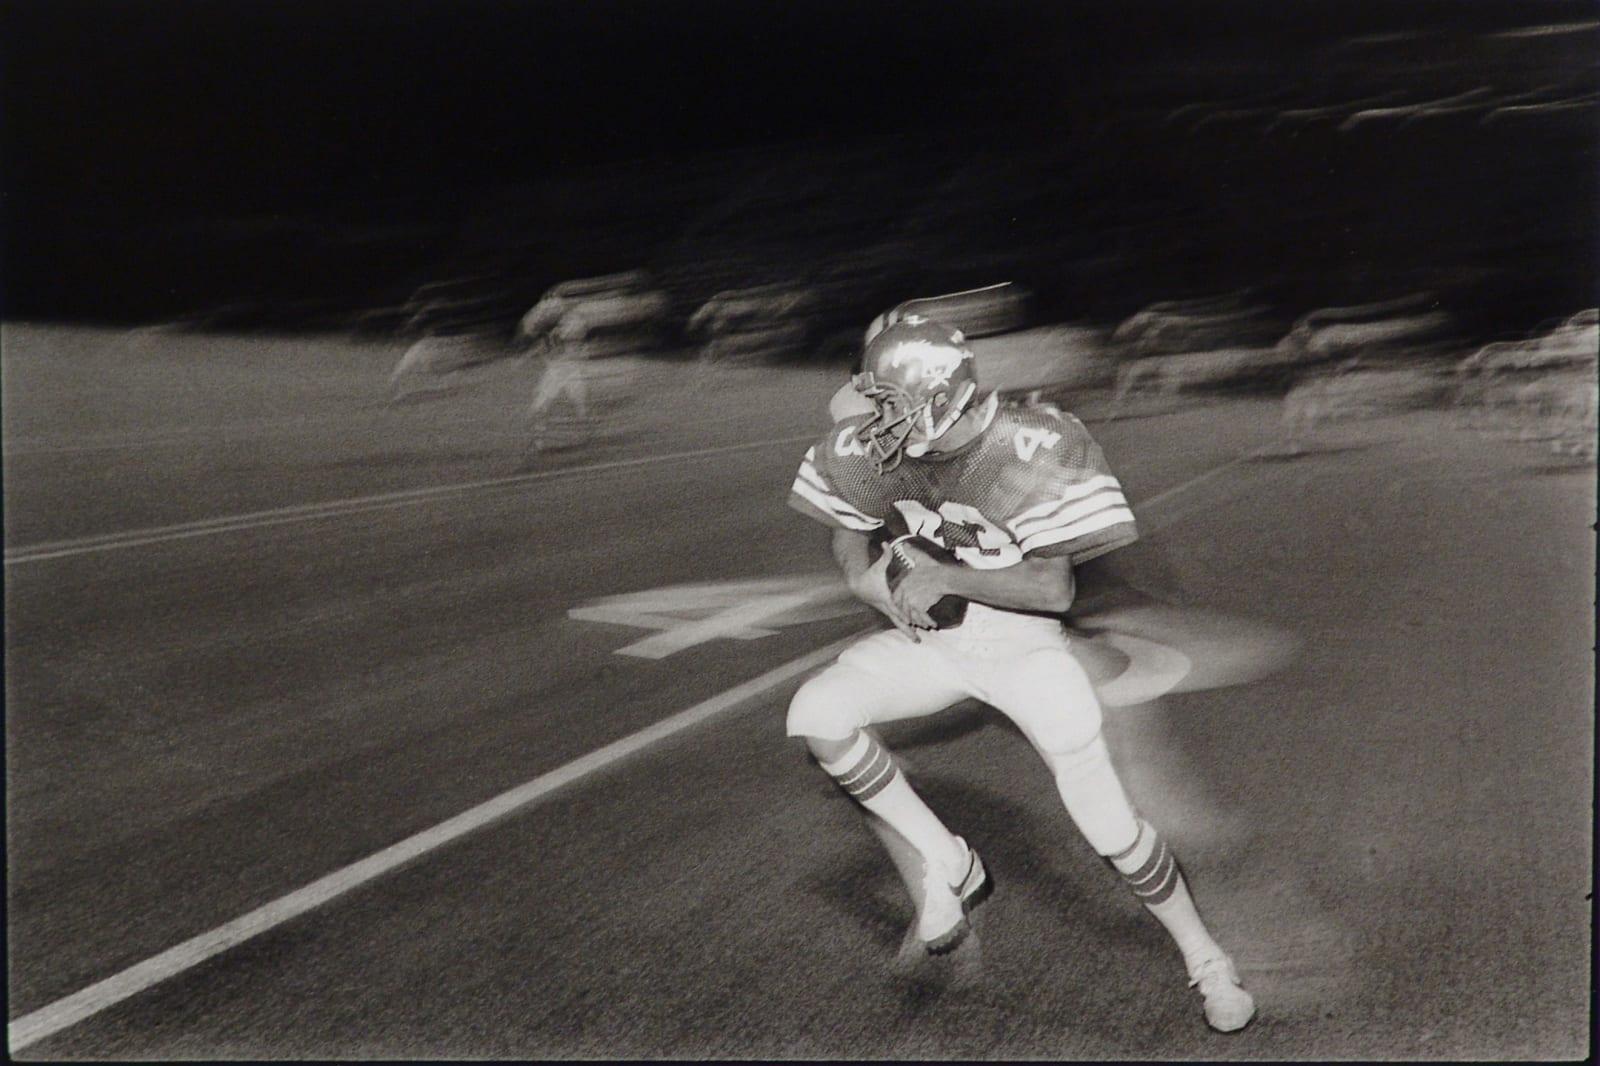 Geoff Winningham - Houston Memorial vs. Northbrook, 1978